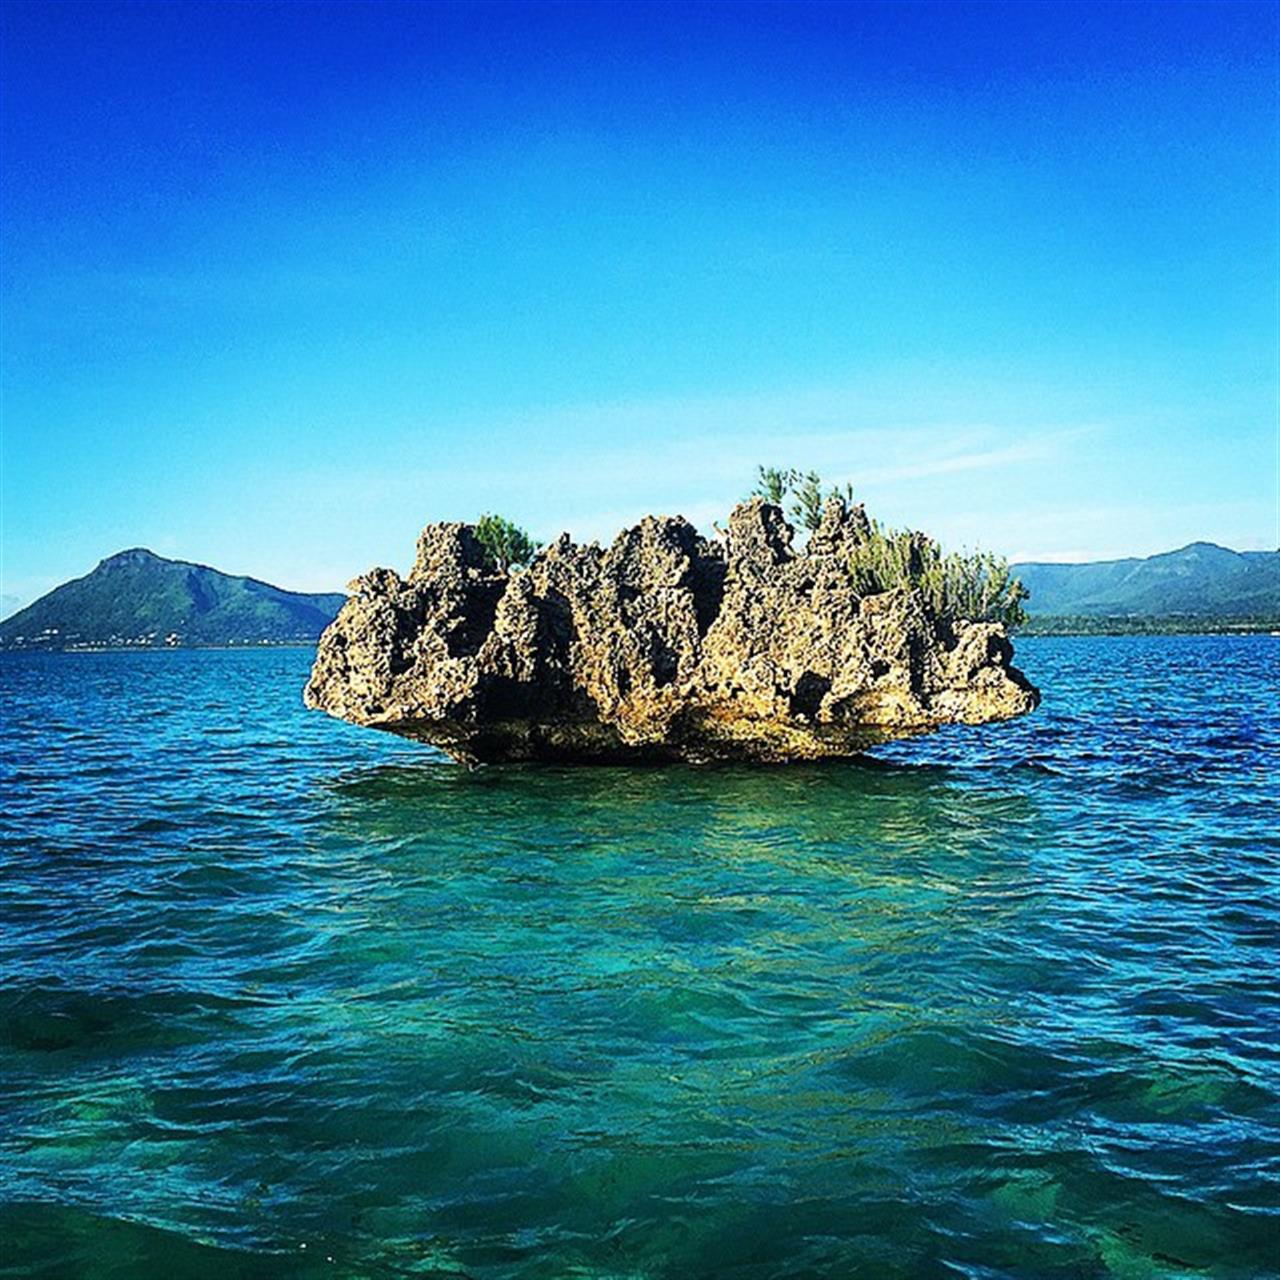 The #lagoon in #mauritius #LeadingRelocal